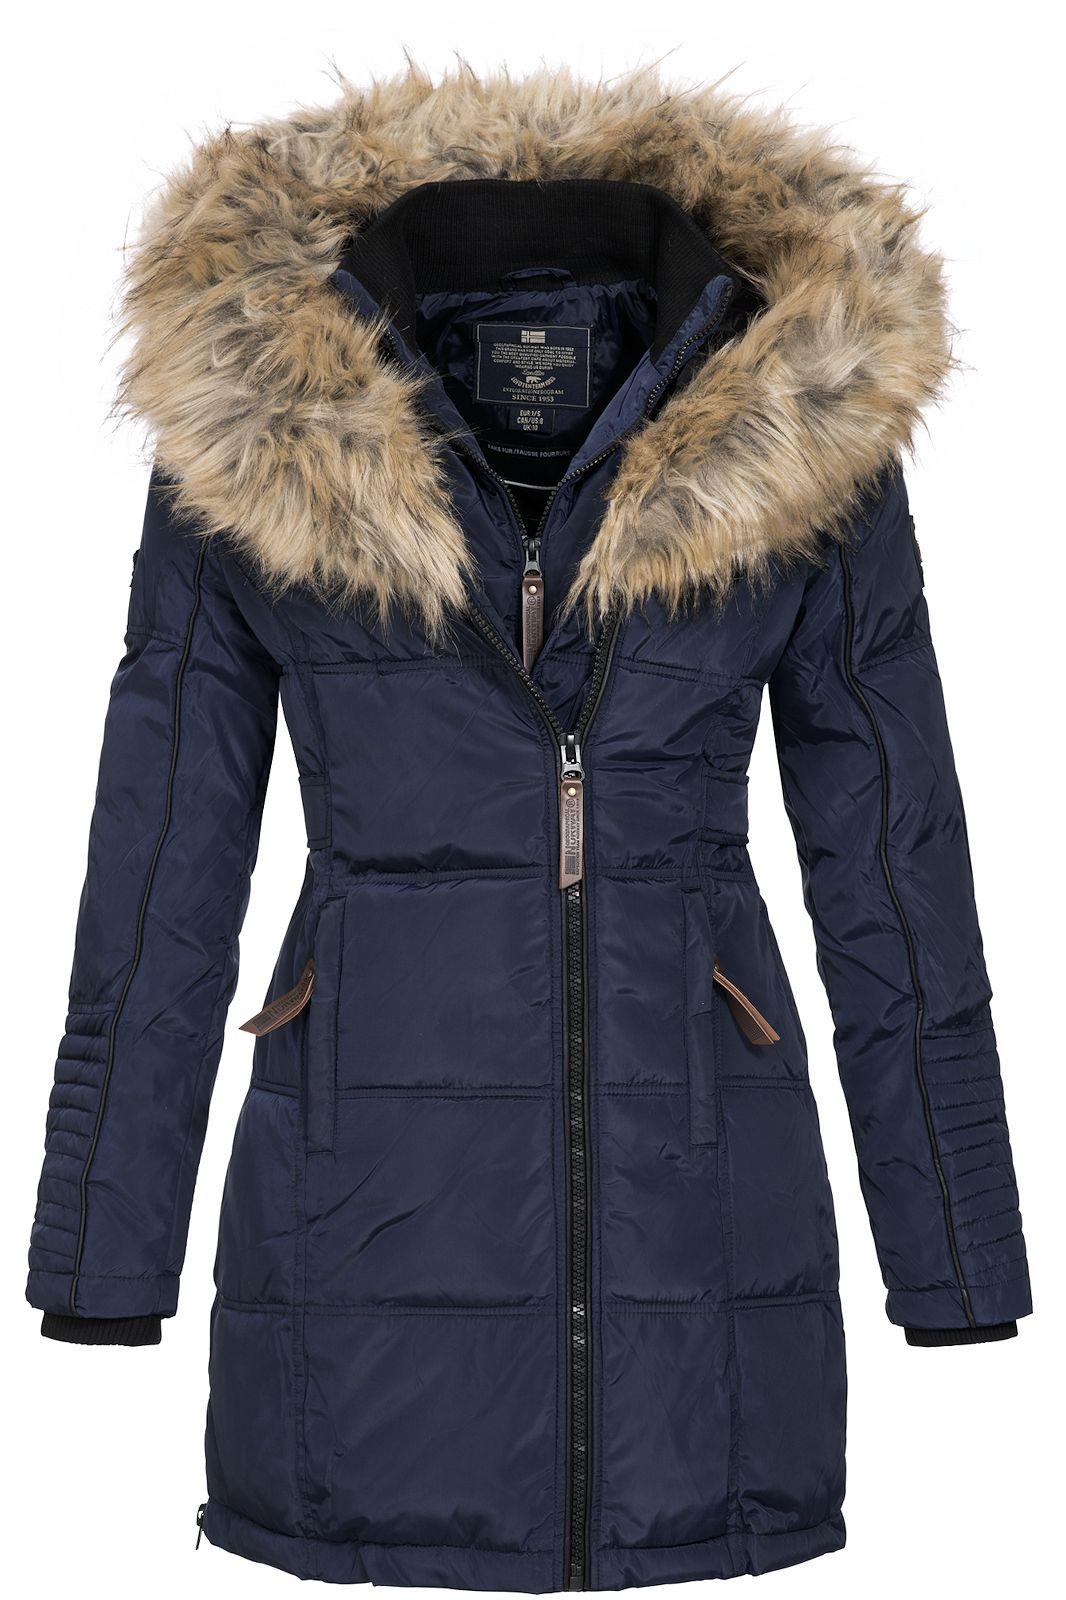 geographical norway damen winterparka belissima blau l mantel jacke ski anorak 3543114799691 ebay. Black Bedroom Furniture Sets. Home Design Ideas